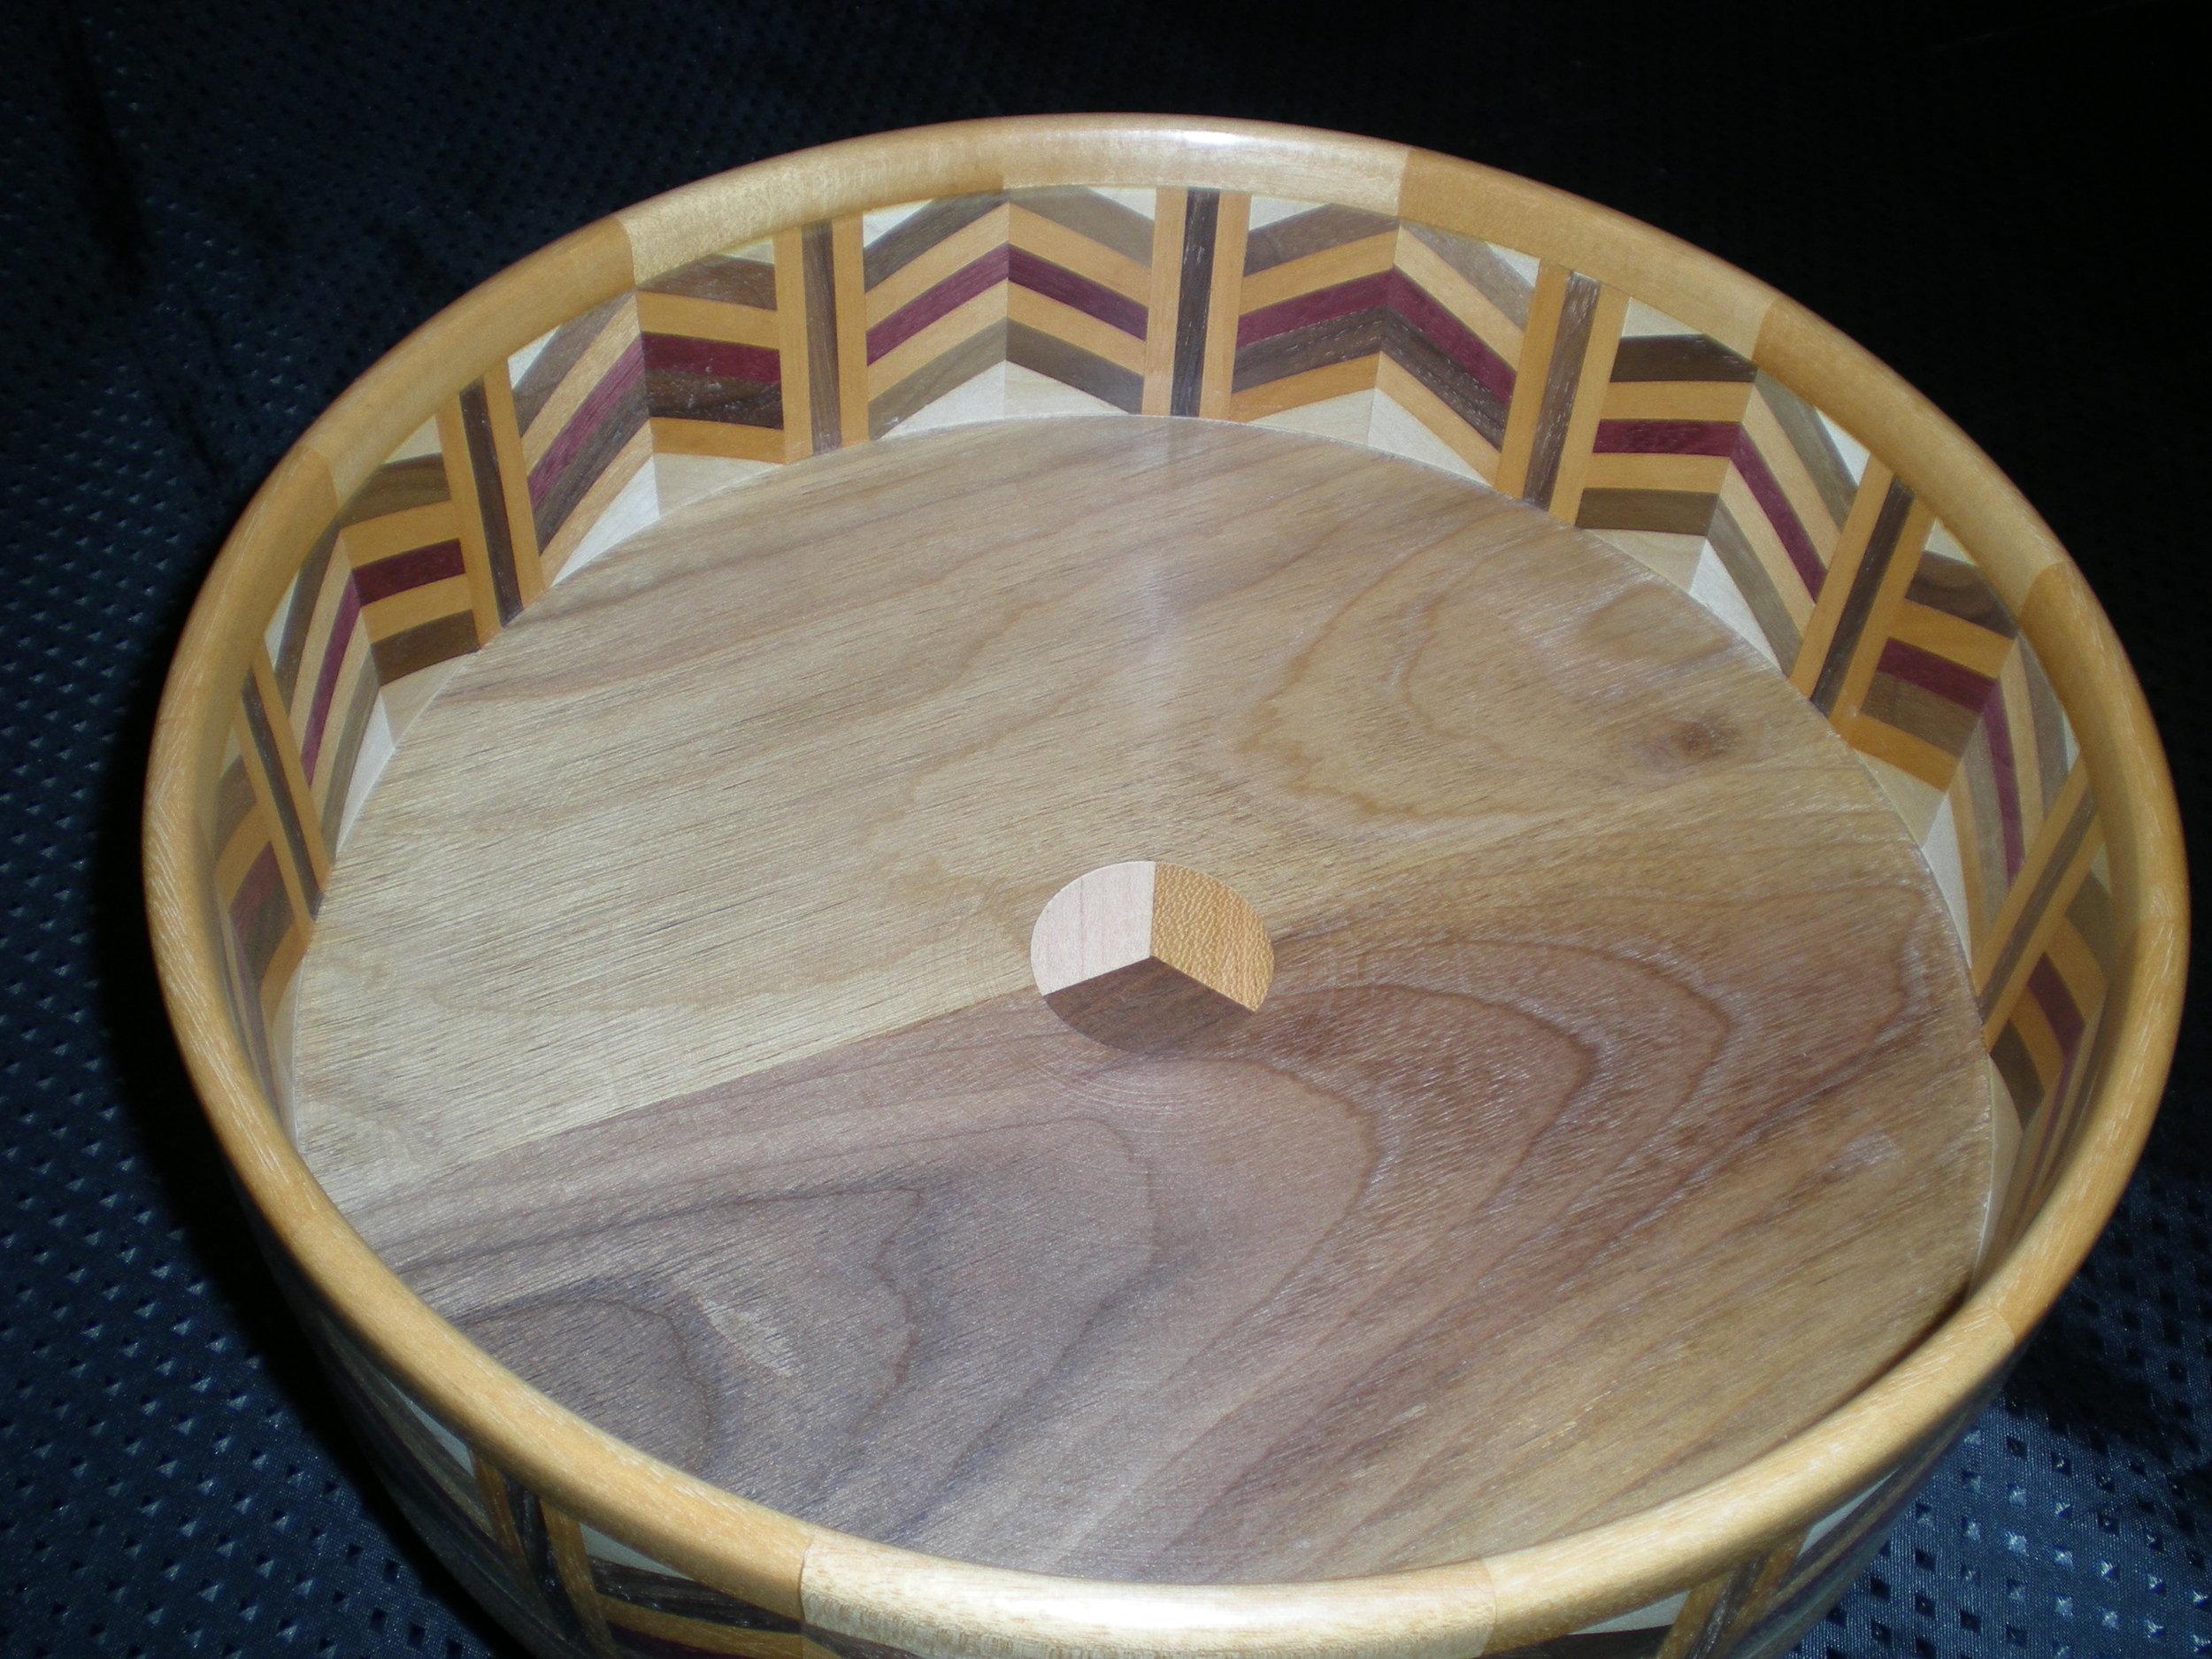 RJC Wood Creations - Bowls (11).JPG